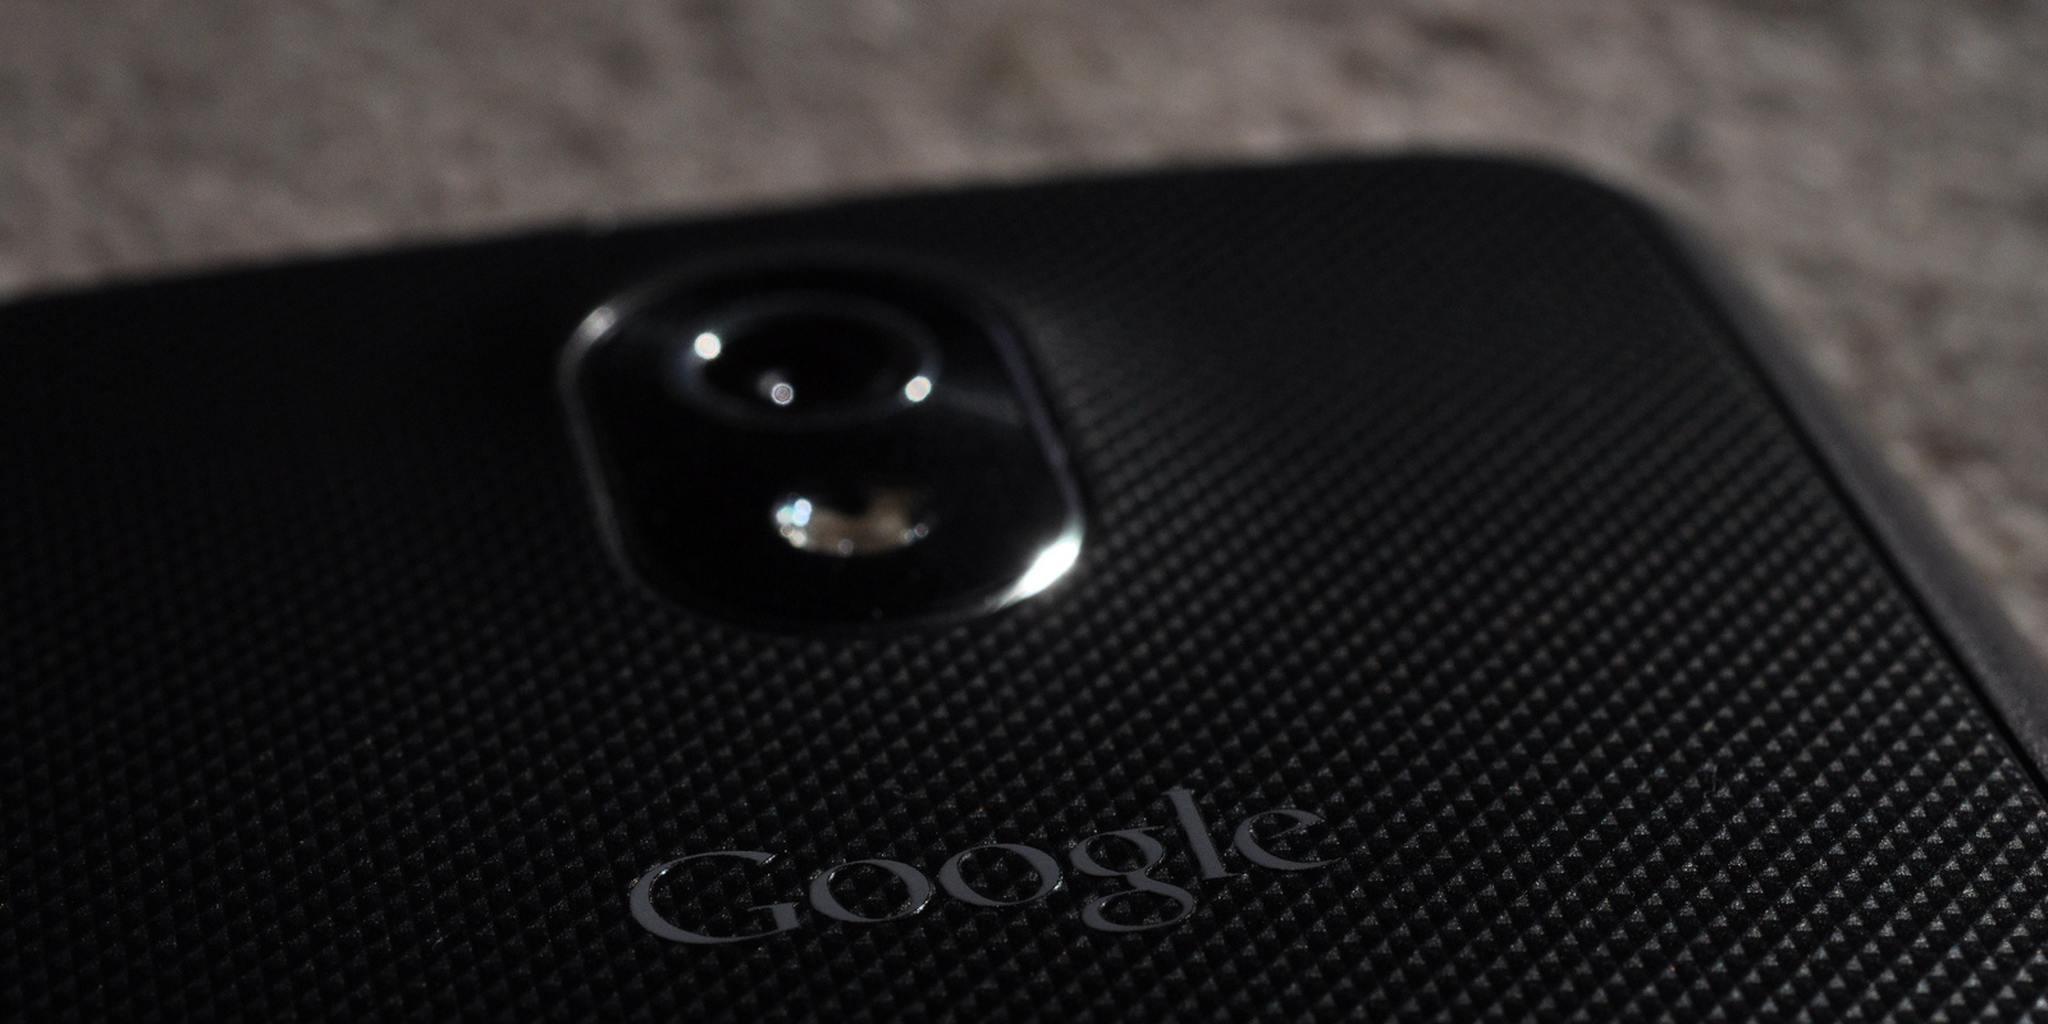 Google in the dark | Flickr - Photo Sharing!